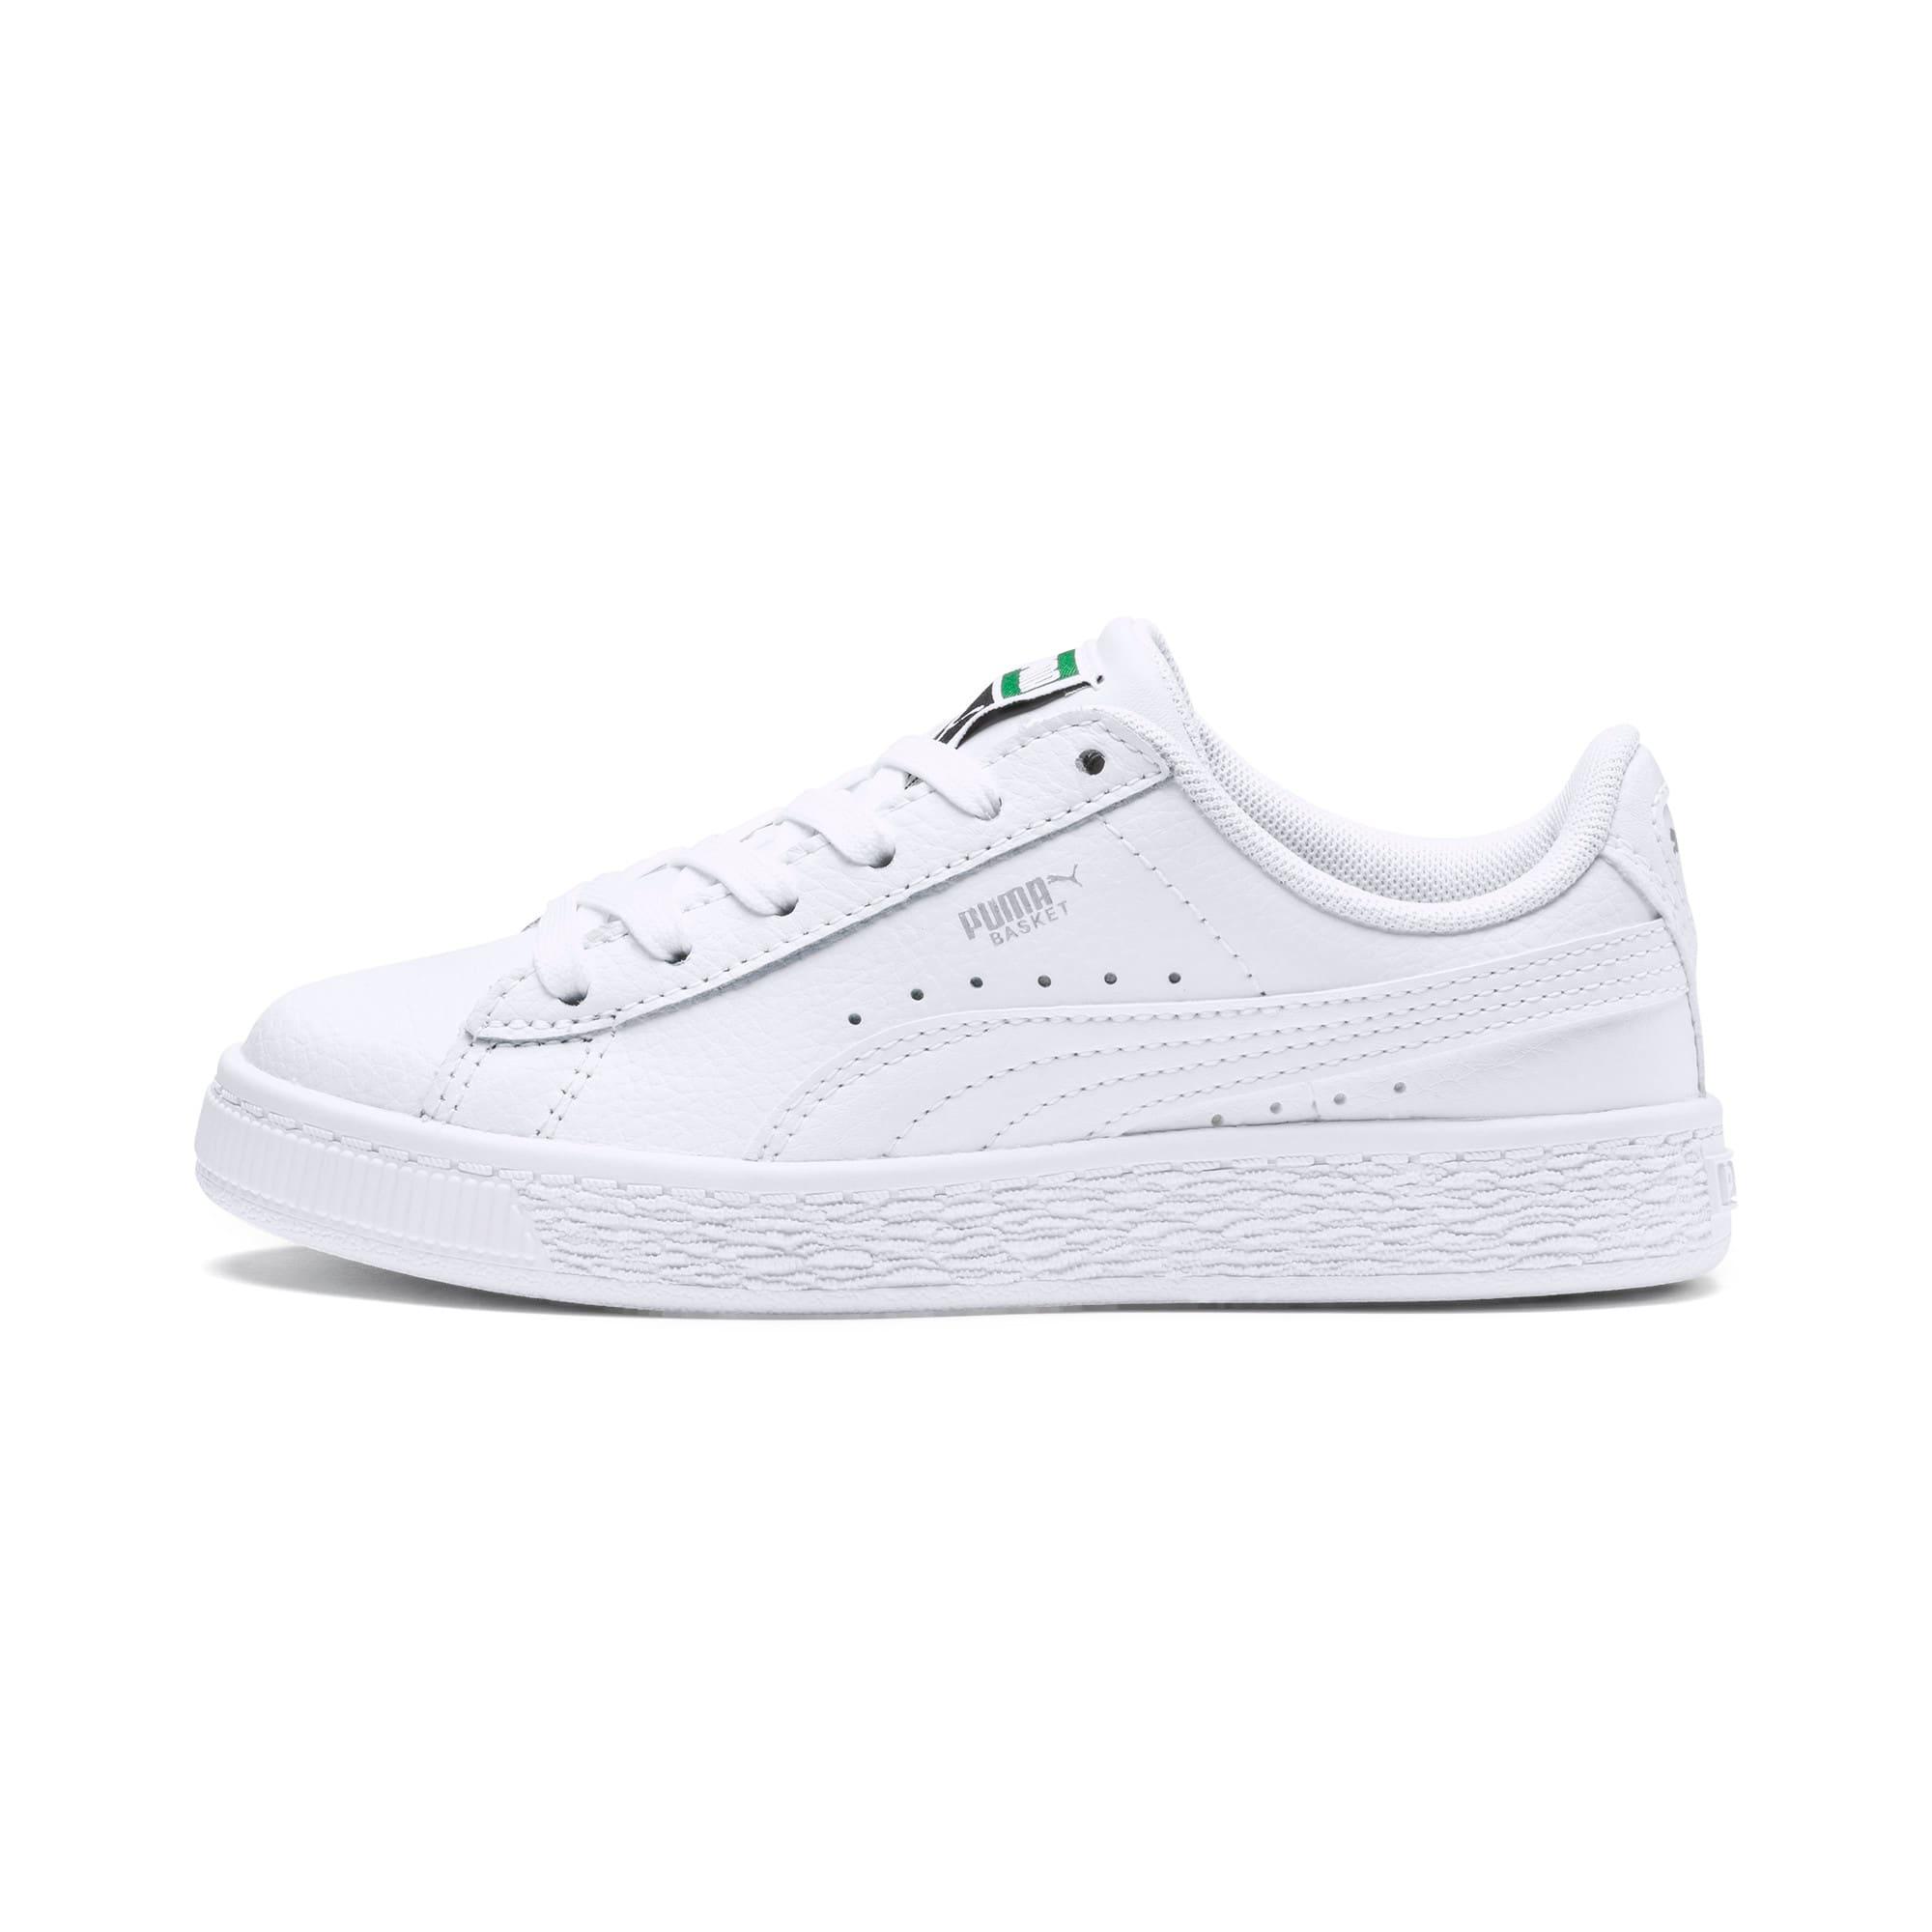 Thumbnail 1 of Basket Classic Little Kids' Shoes, Puma White-Puma White, medium